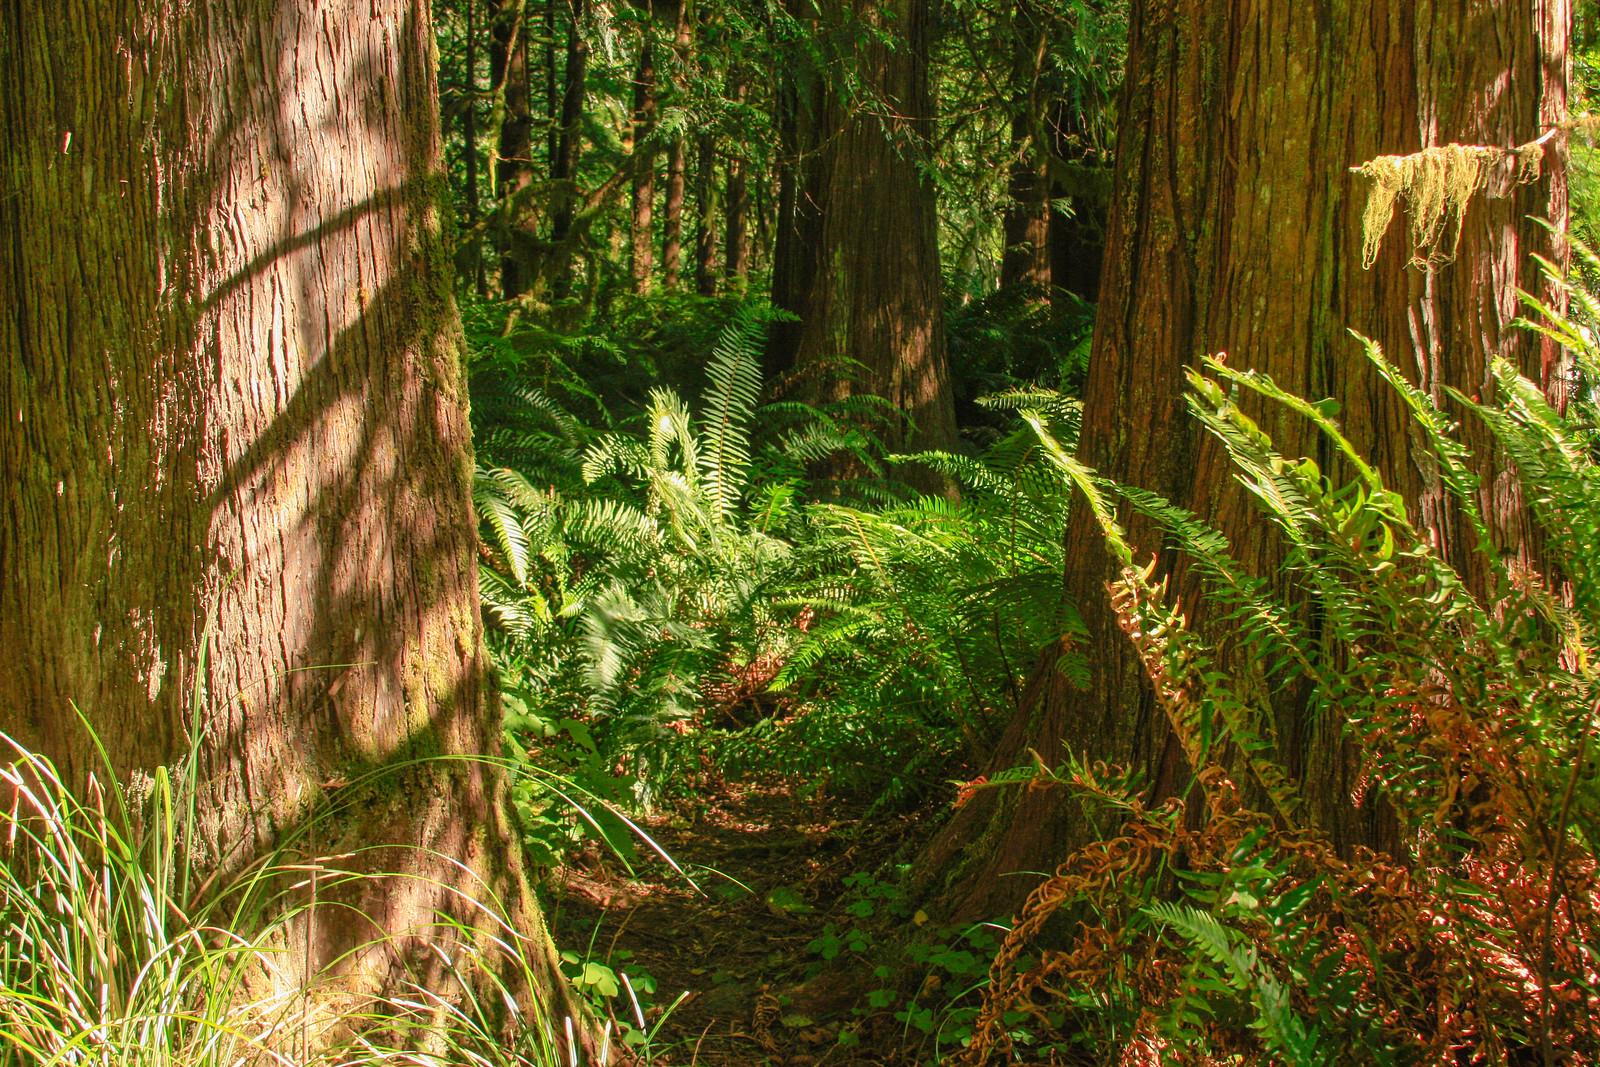 Western Washington Forest